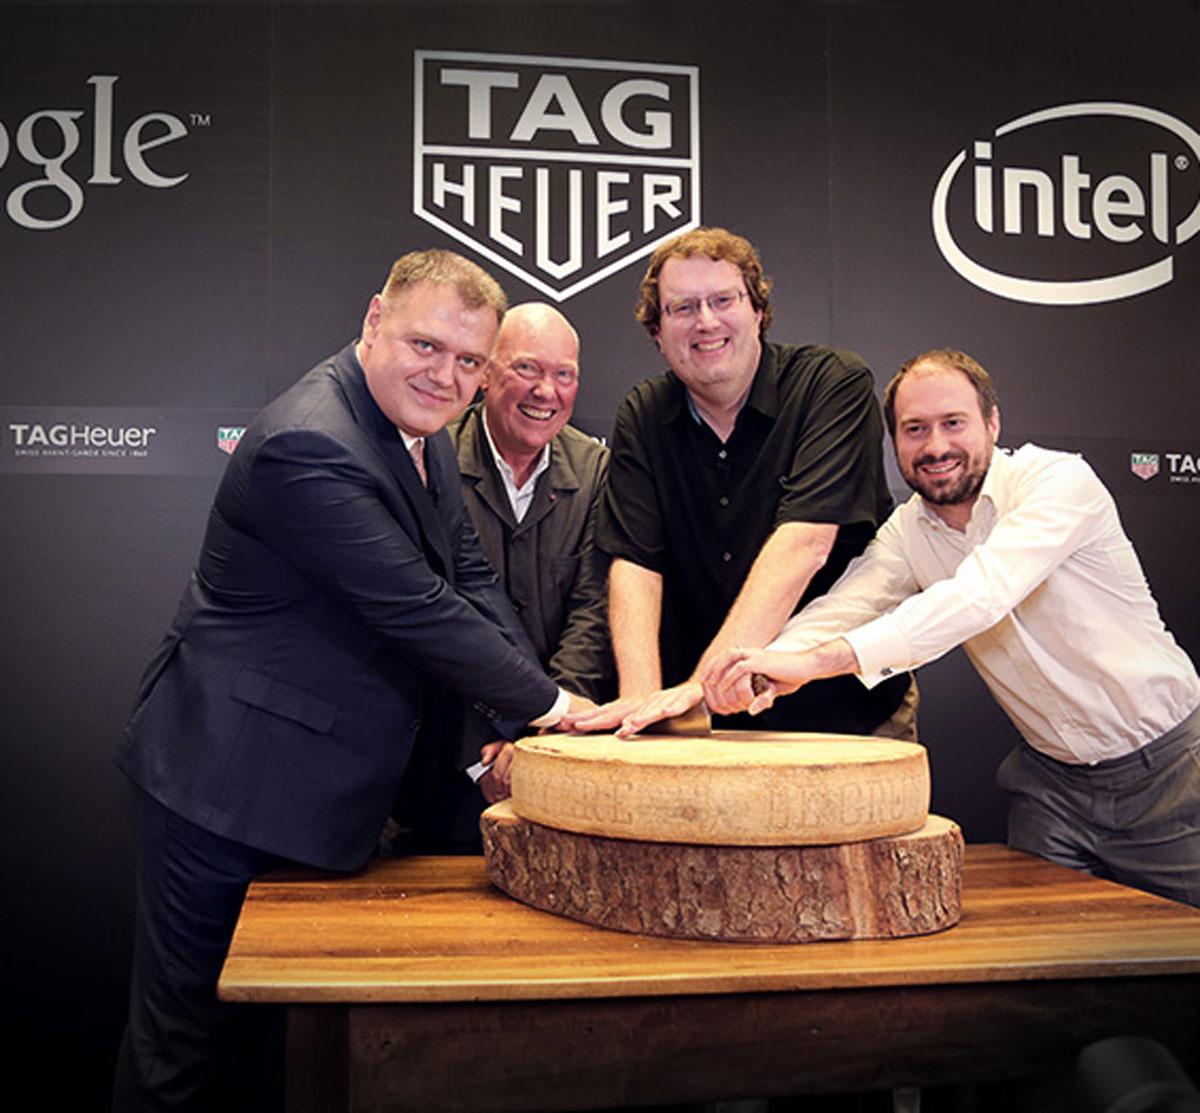 tag-heuer-intel-google-smartwatch